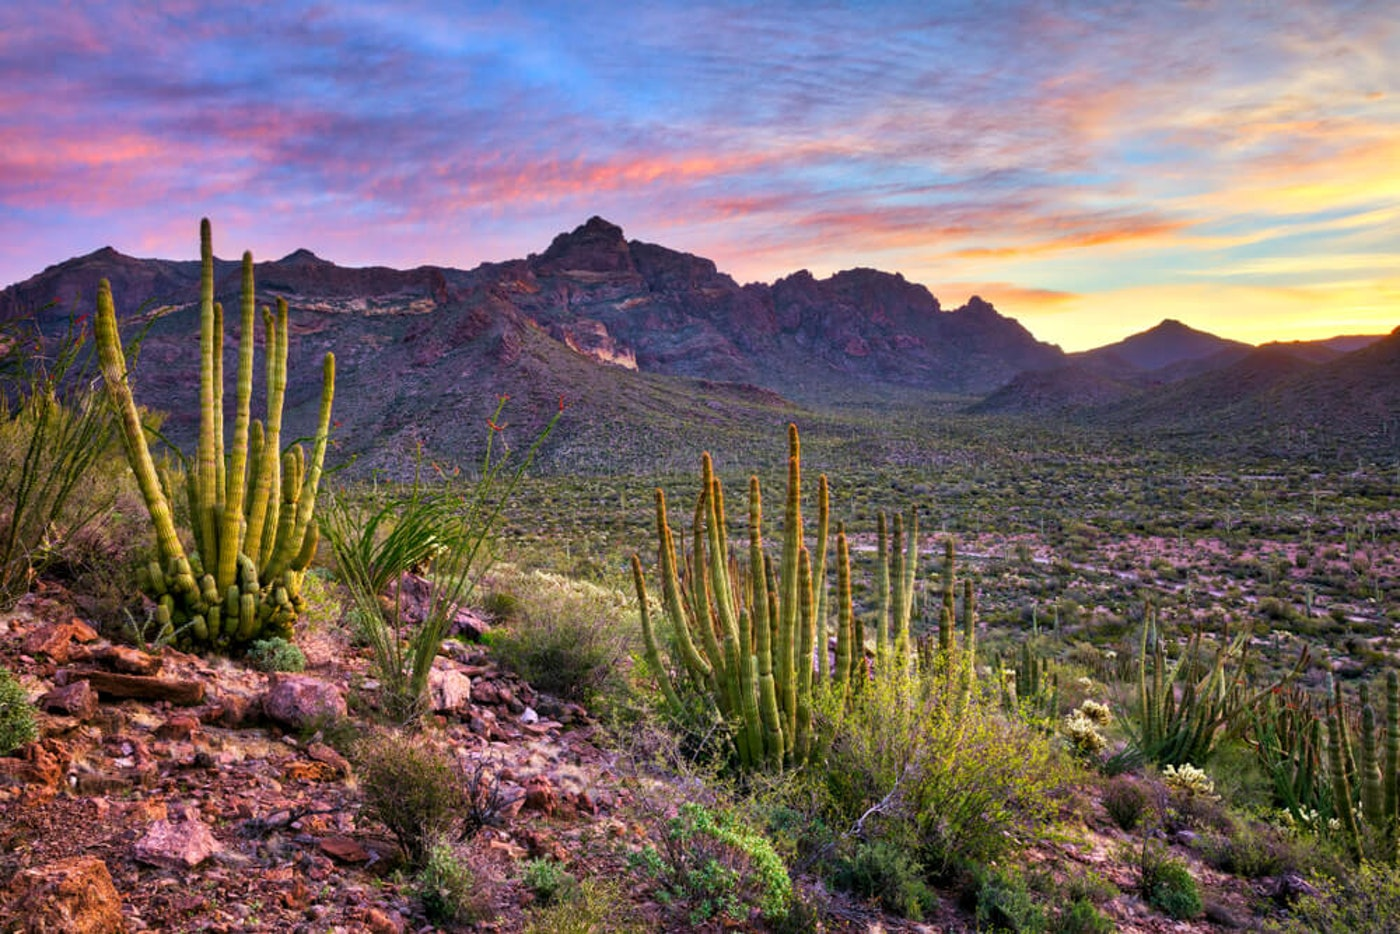 Organ Pipe Cactus National Monument|Stock Photo